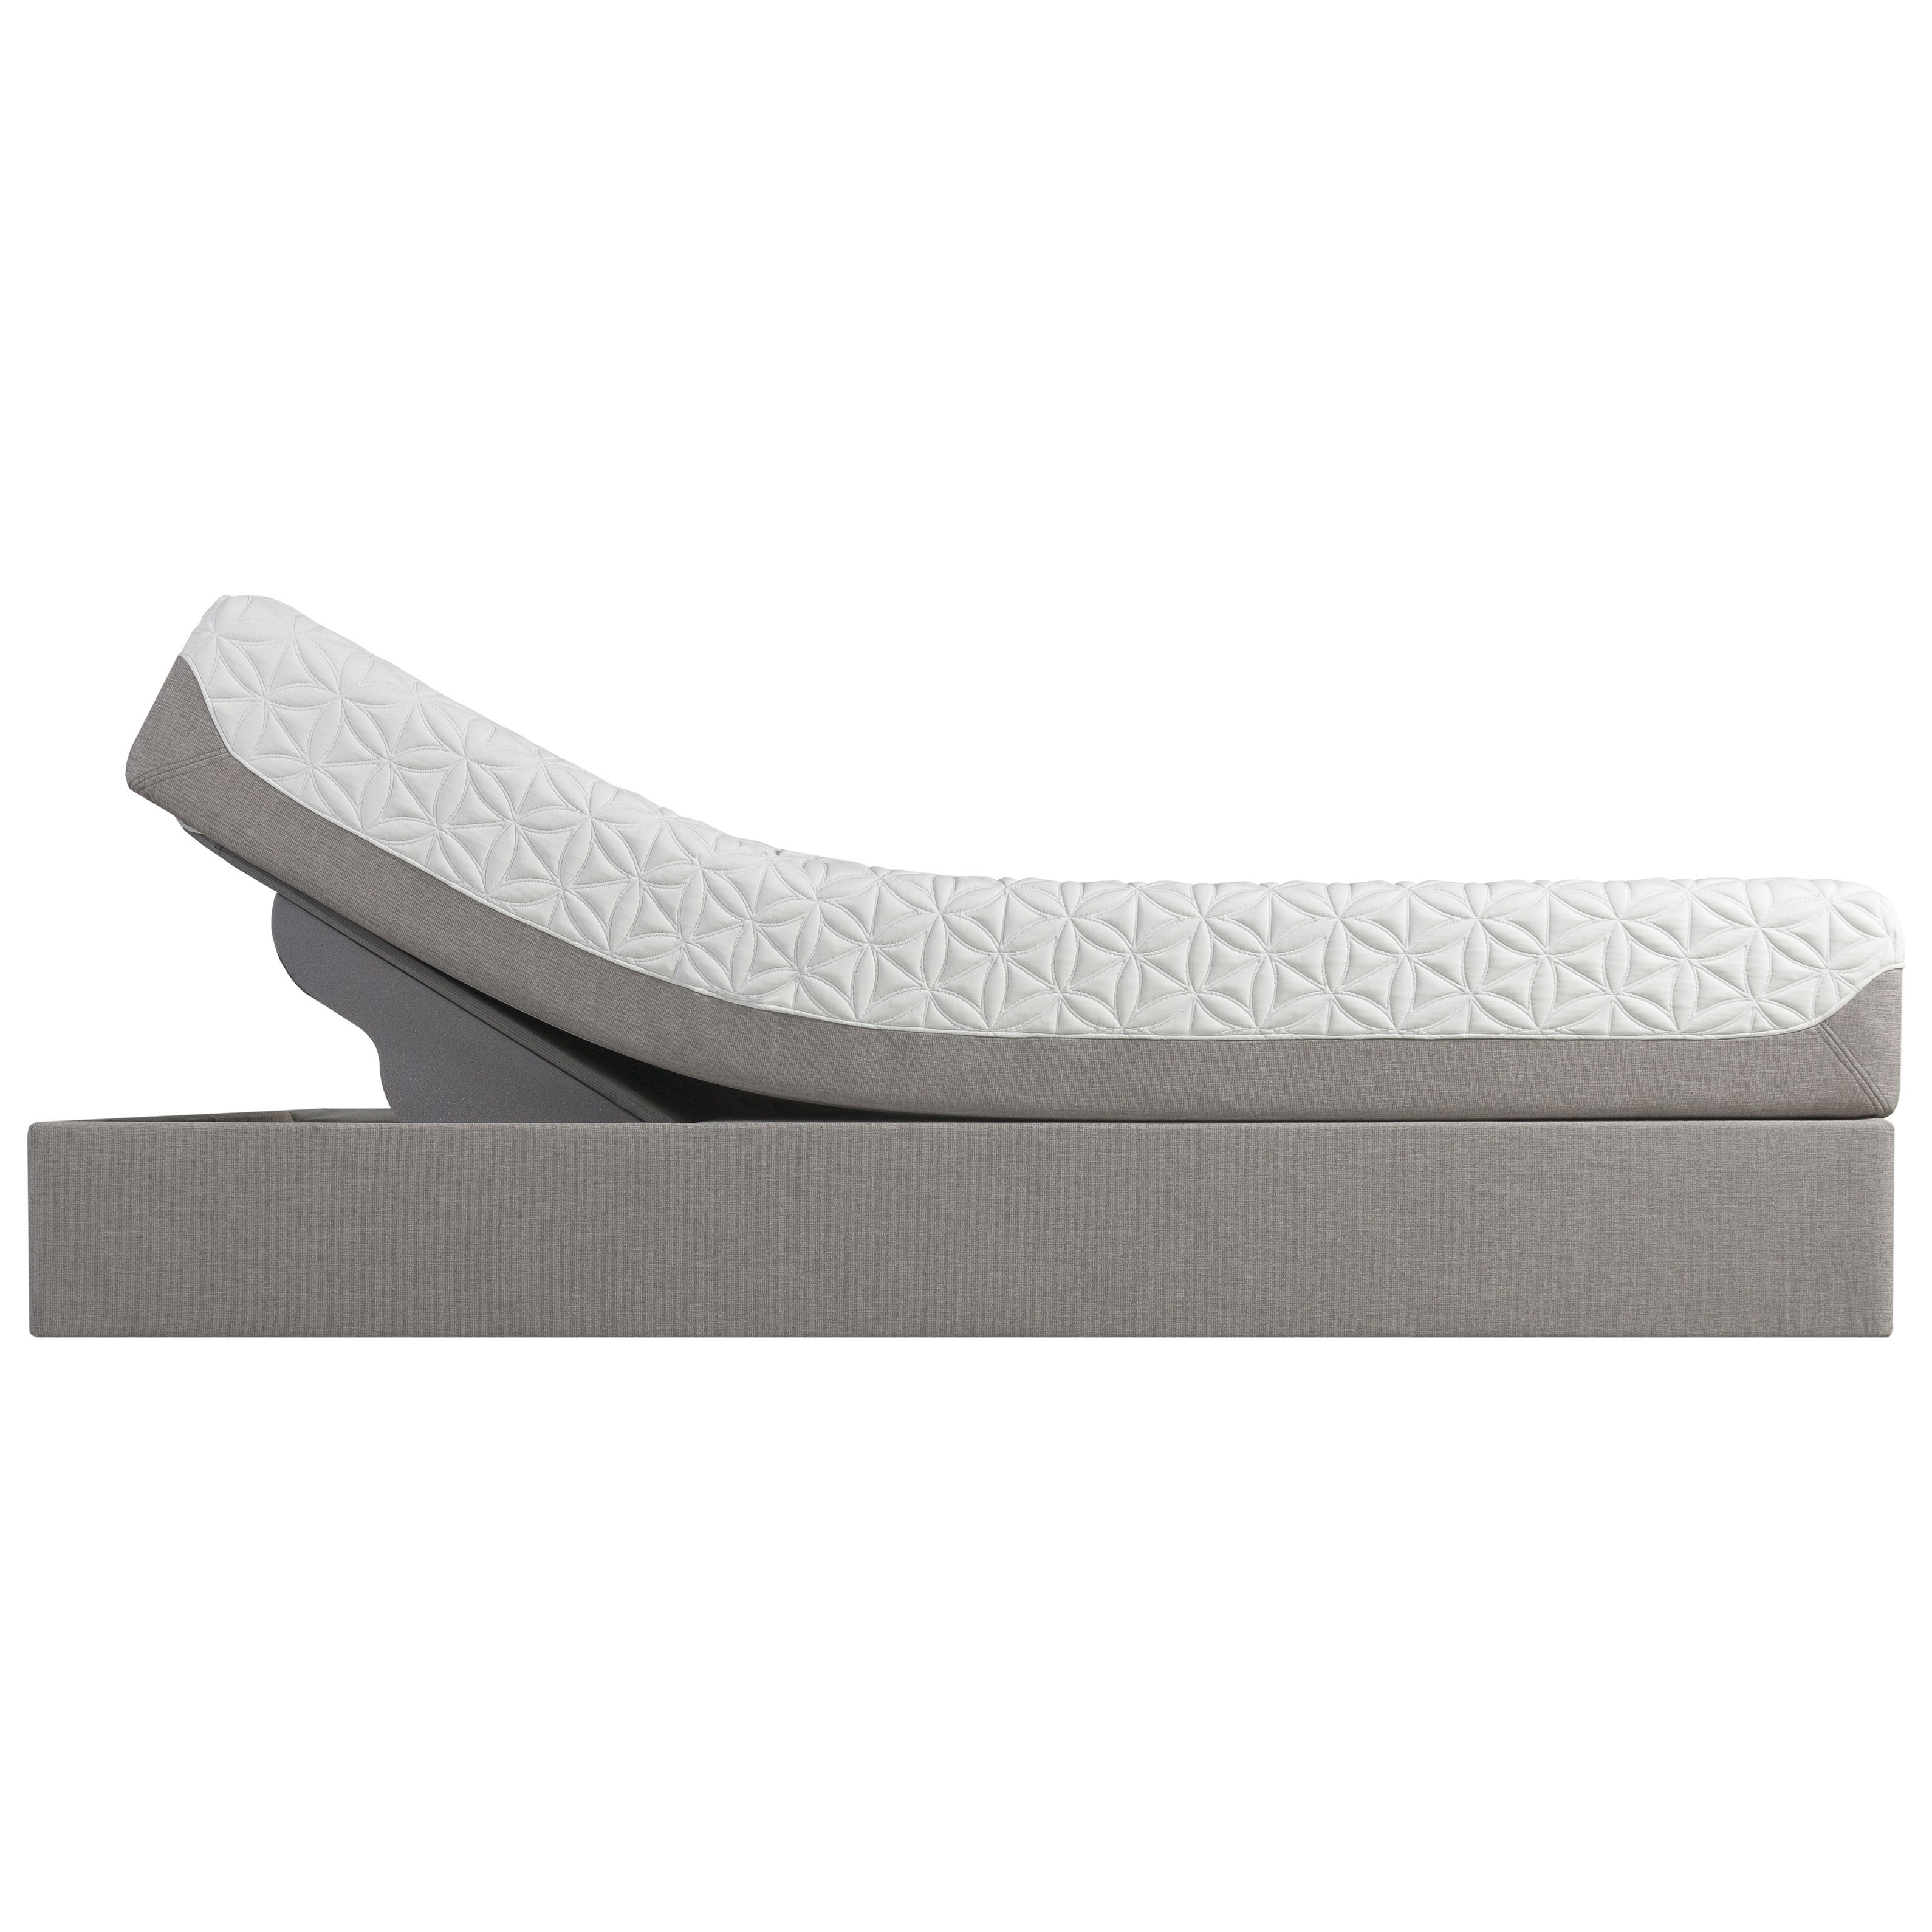 Tempur-Pedic® TEMPUR-Cloud Prima Cal King Medium-Soft Mattress Set - Item Number: 10237180+2x25287190